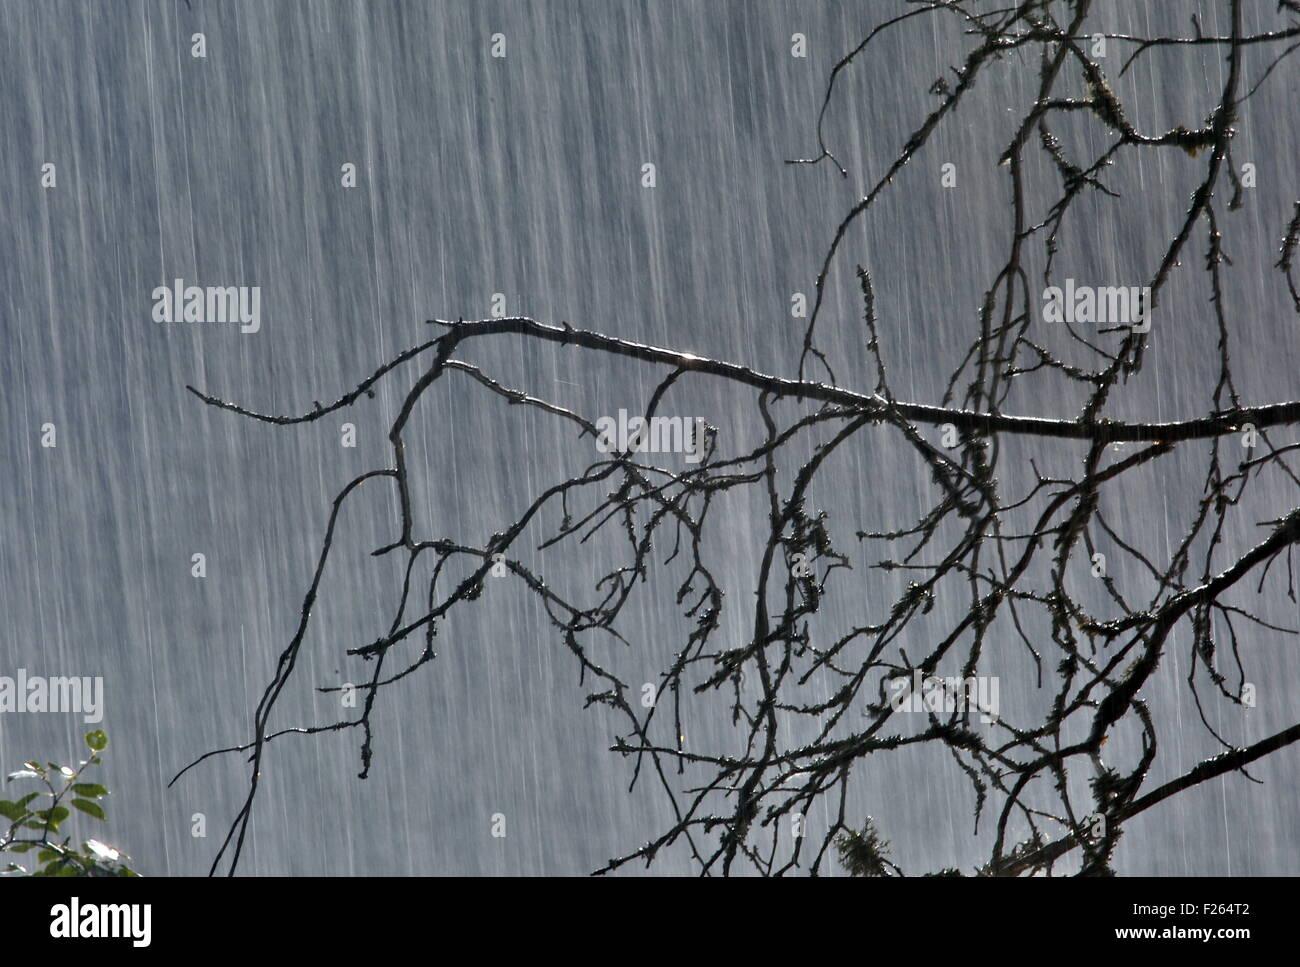 Savonlinna, Finland. 30th July, 2015. Rain falling in a forest. © Valery Matytsin/TASS/Alamy Live News - Stock Image